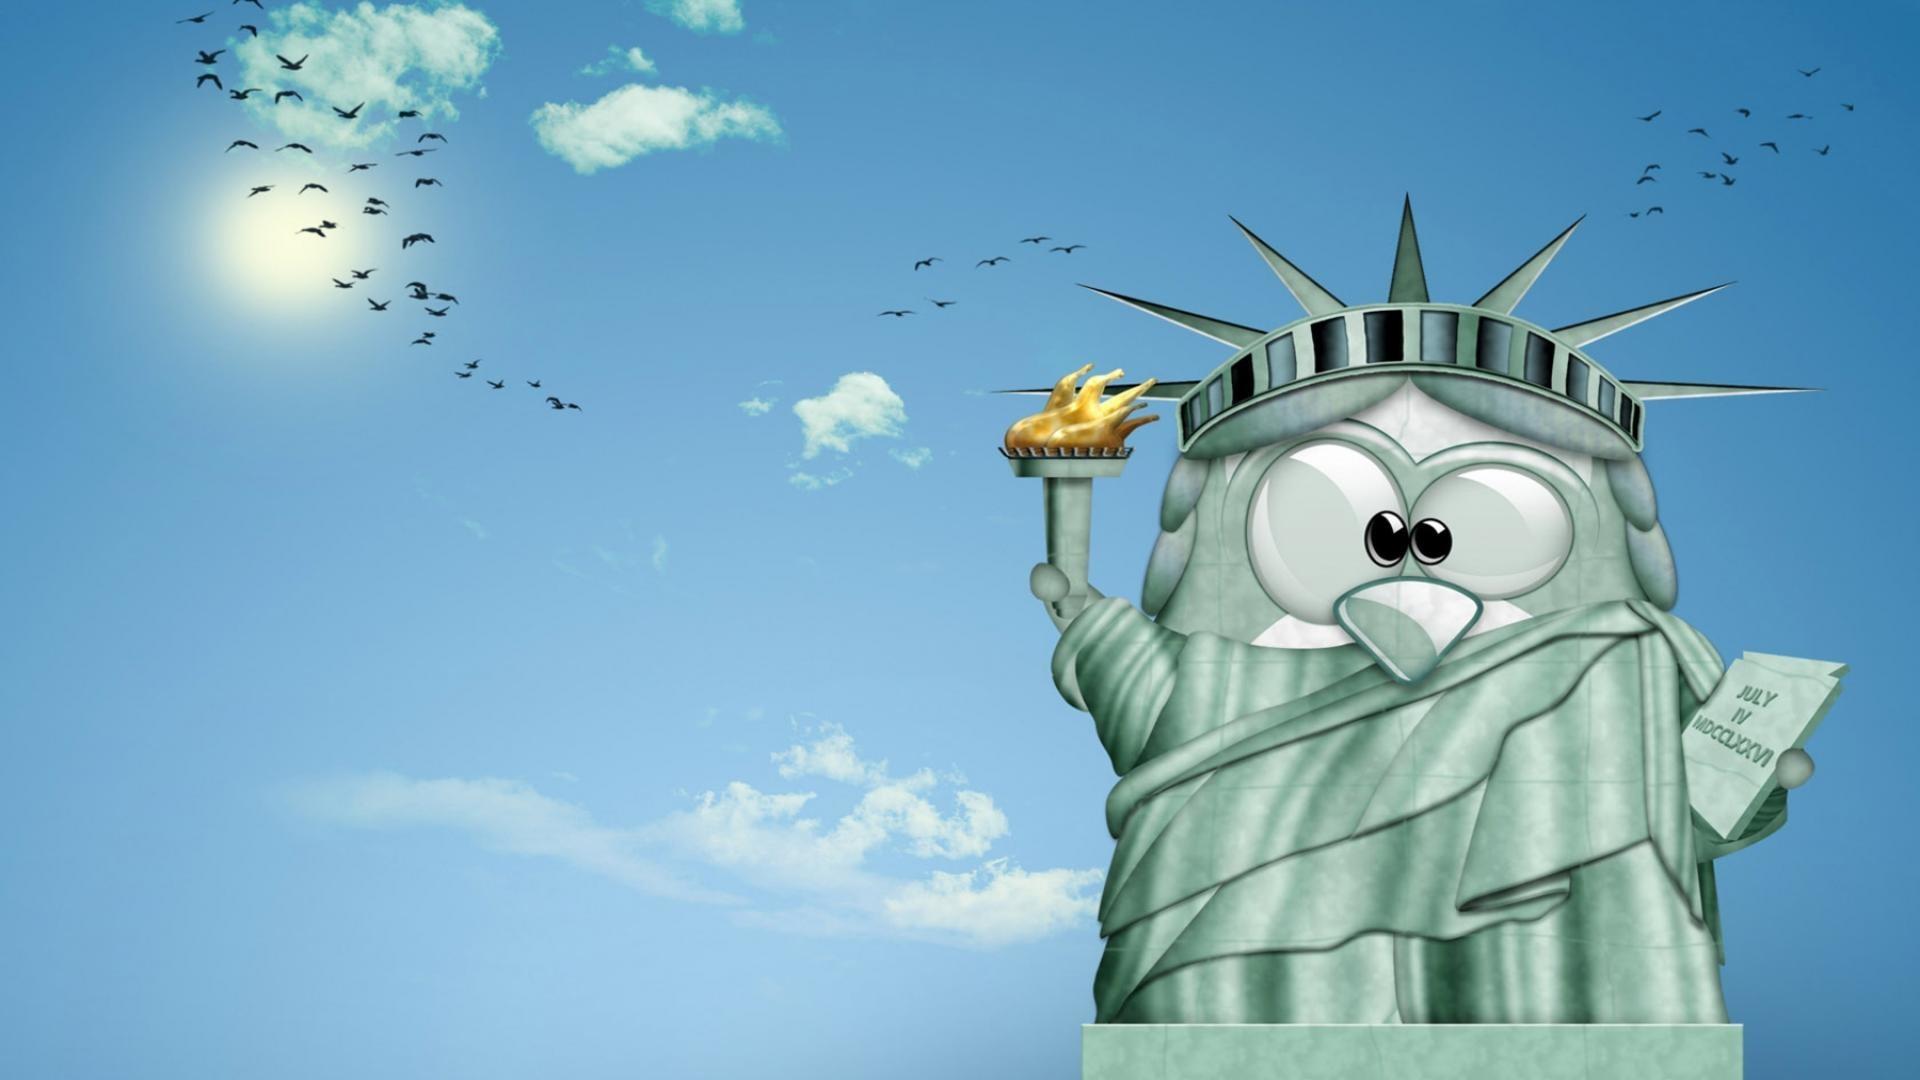 Funny 3d Cartoon Wallpaper 49 Pictures